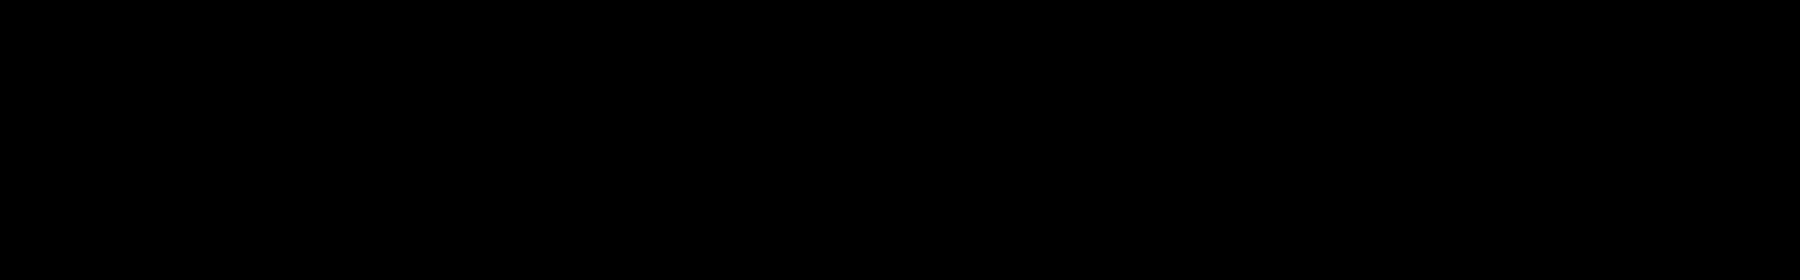 LO-FIRE II audio waveform